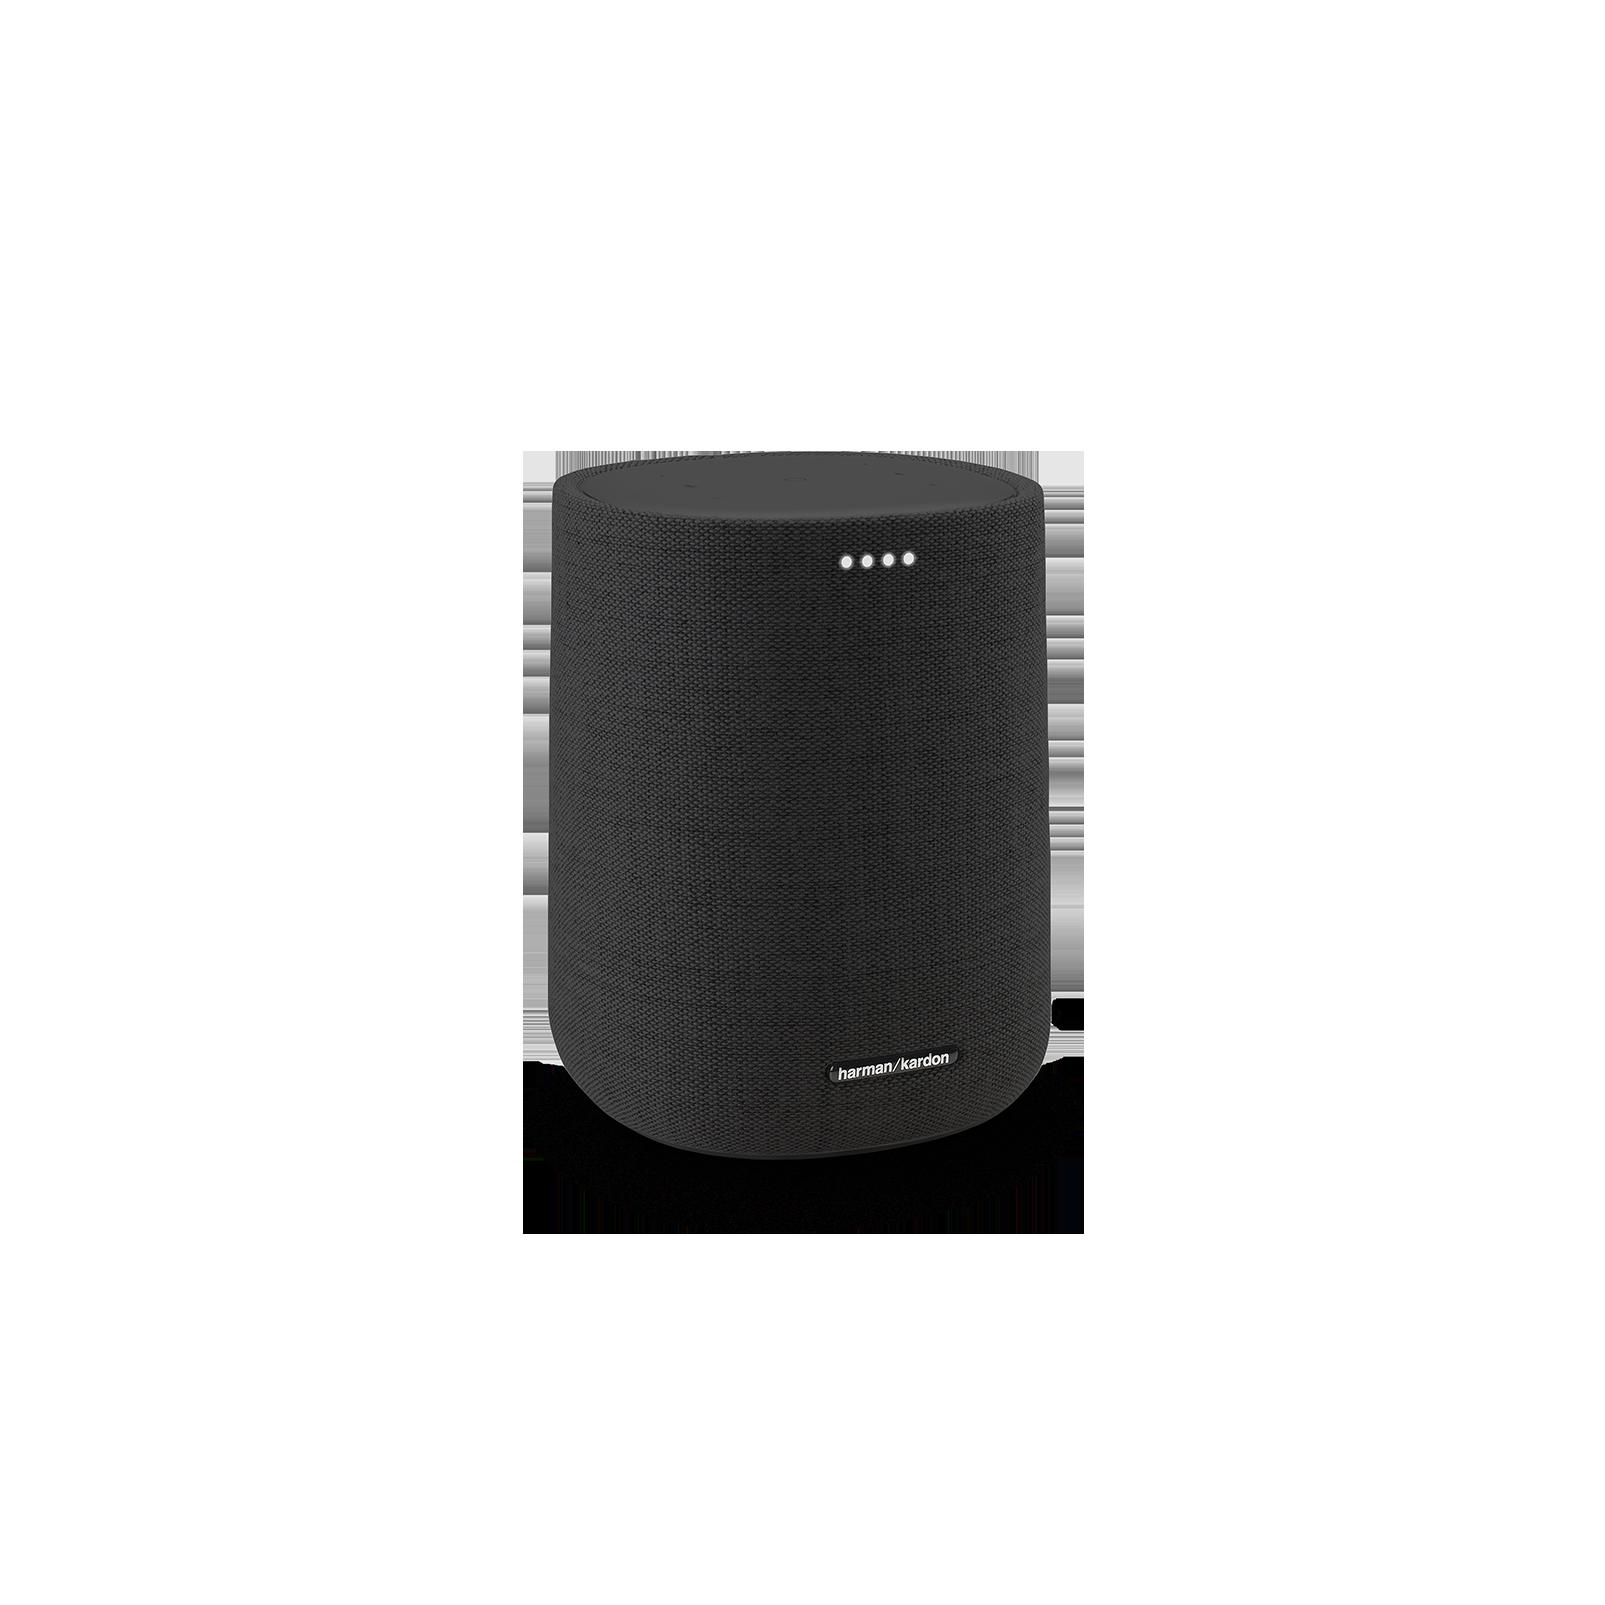 Harman Kardon Citation ONE - Black - Compact, smart and amazing sound - Hero